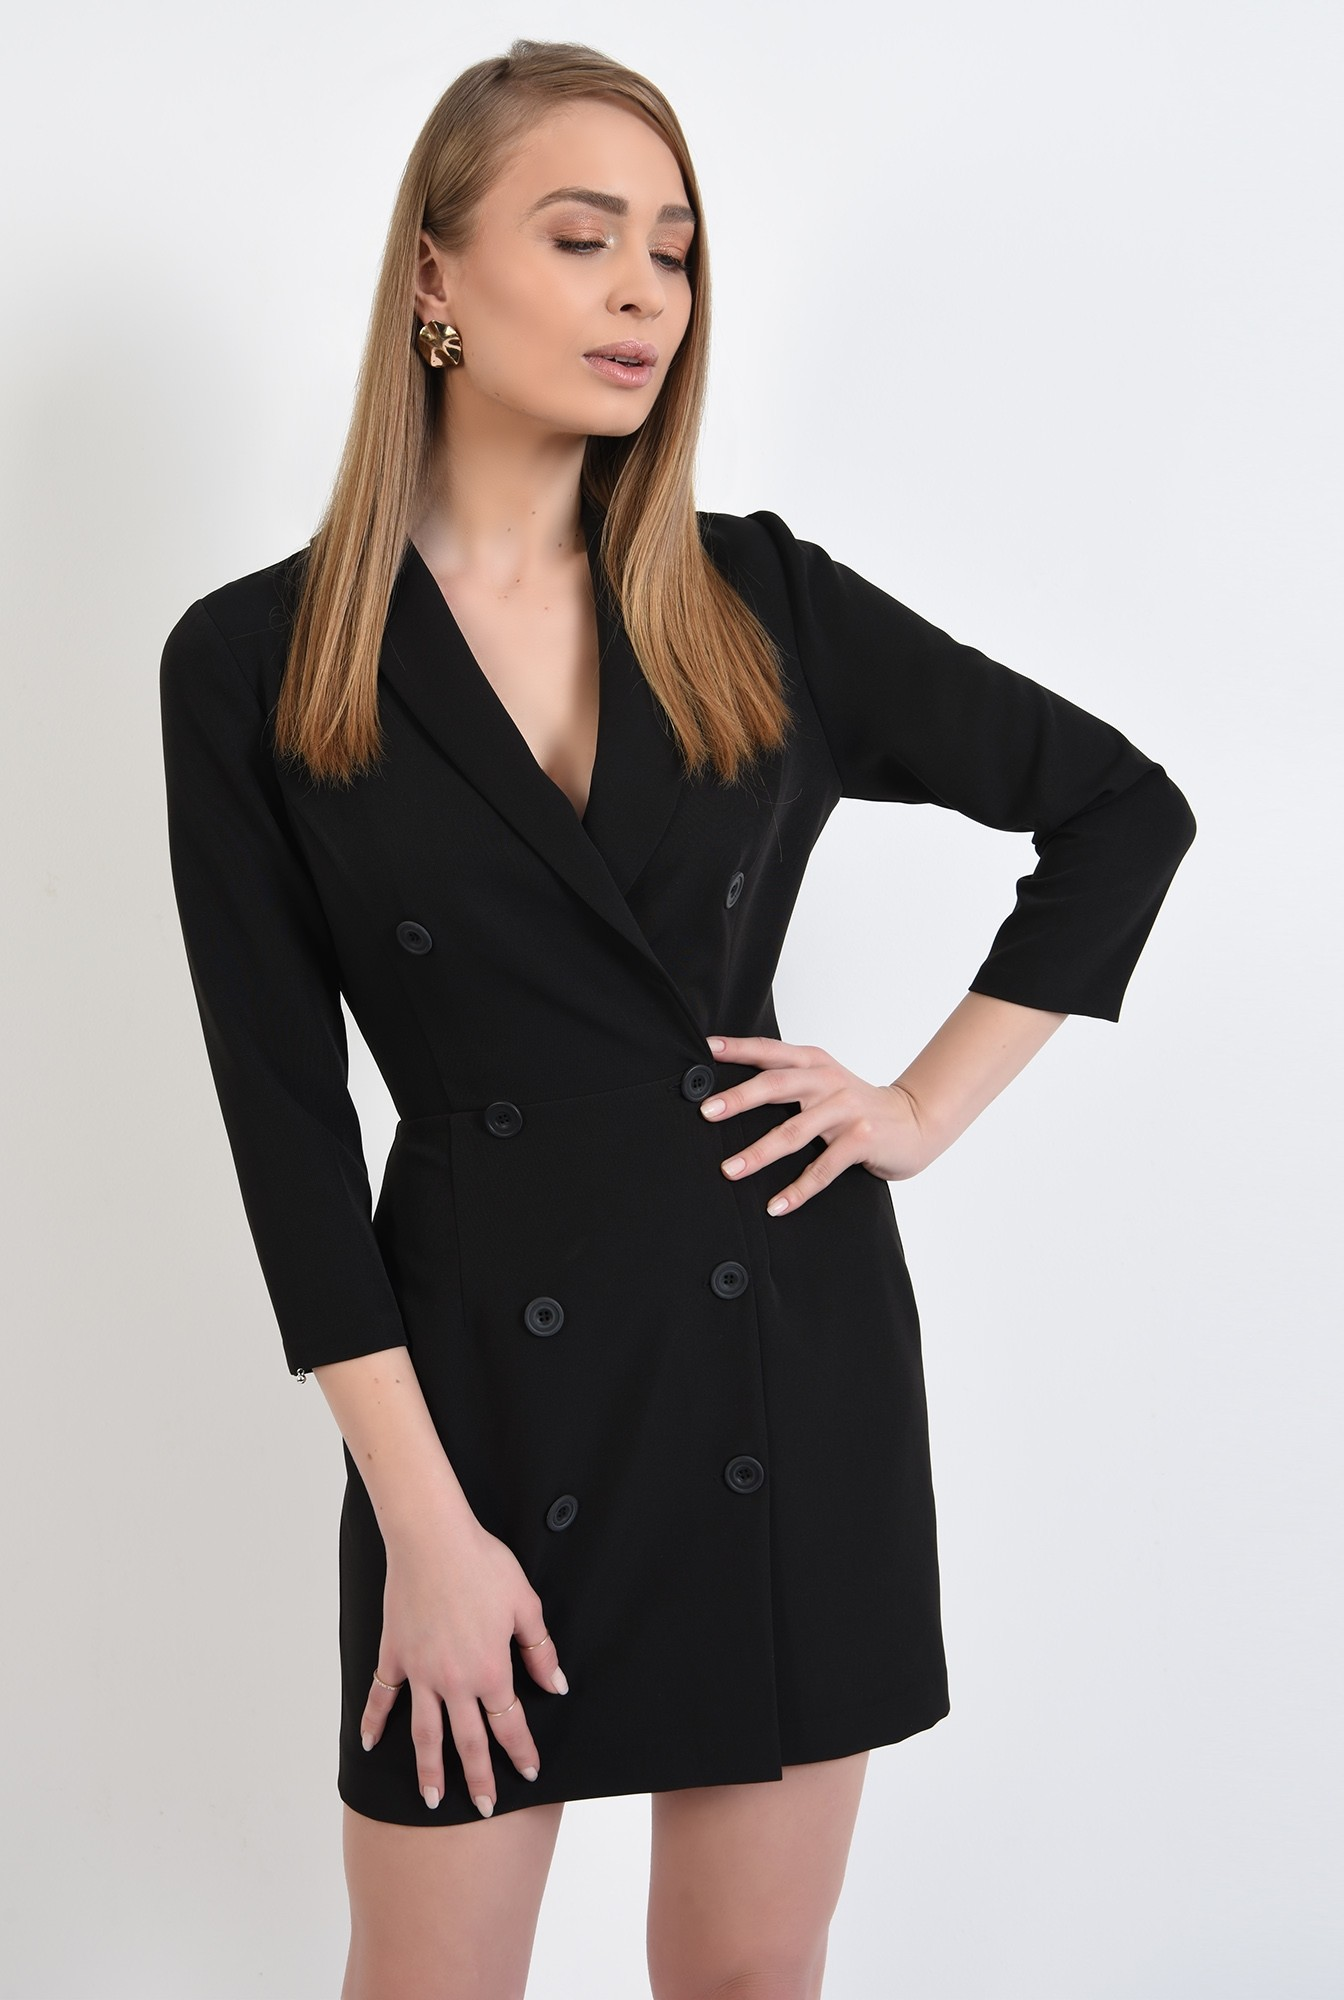 0 - rochie blazer, neagra, scurta, doua randuri de nasturi, revere